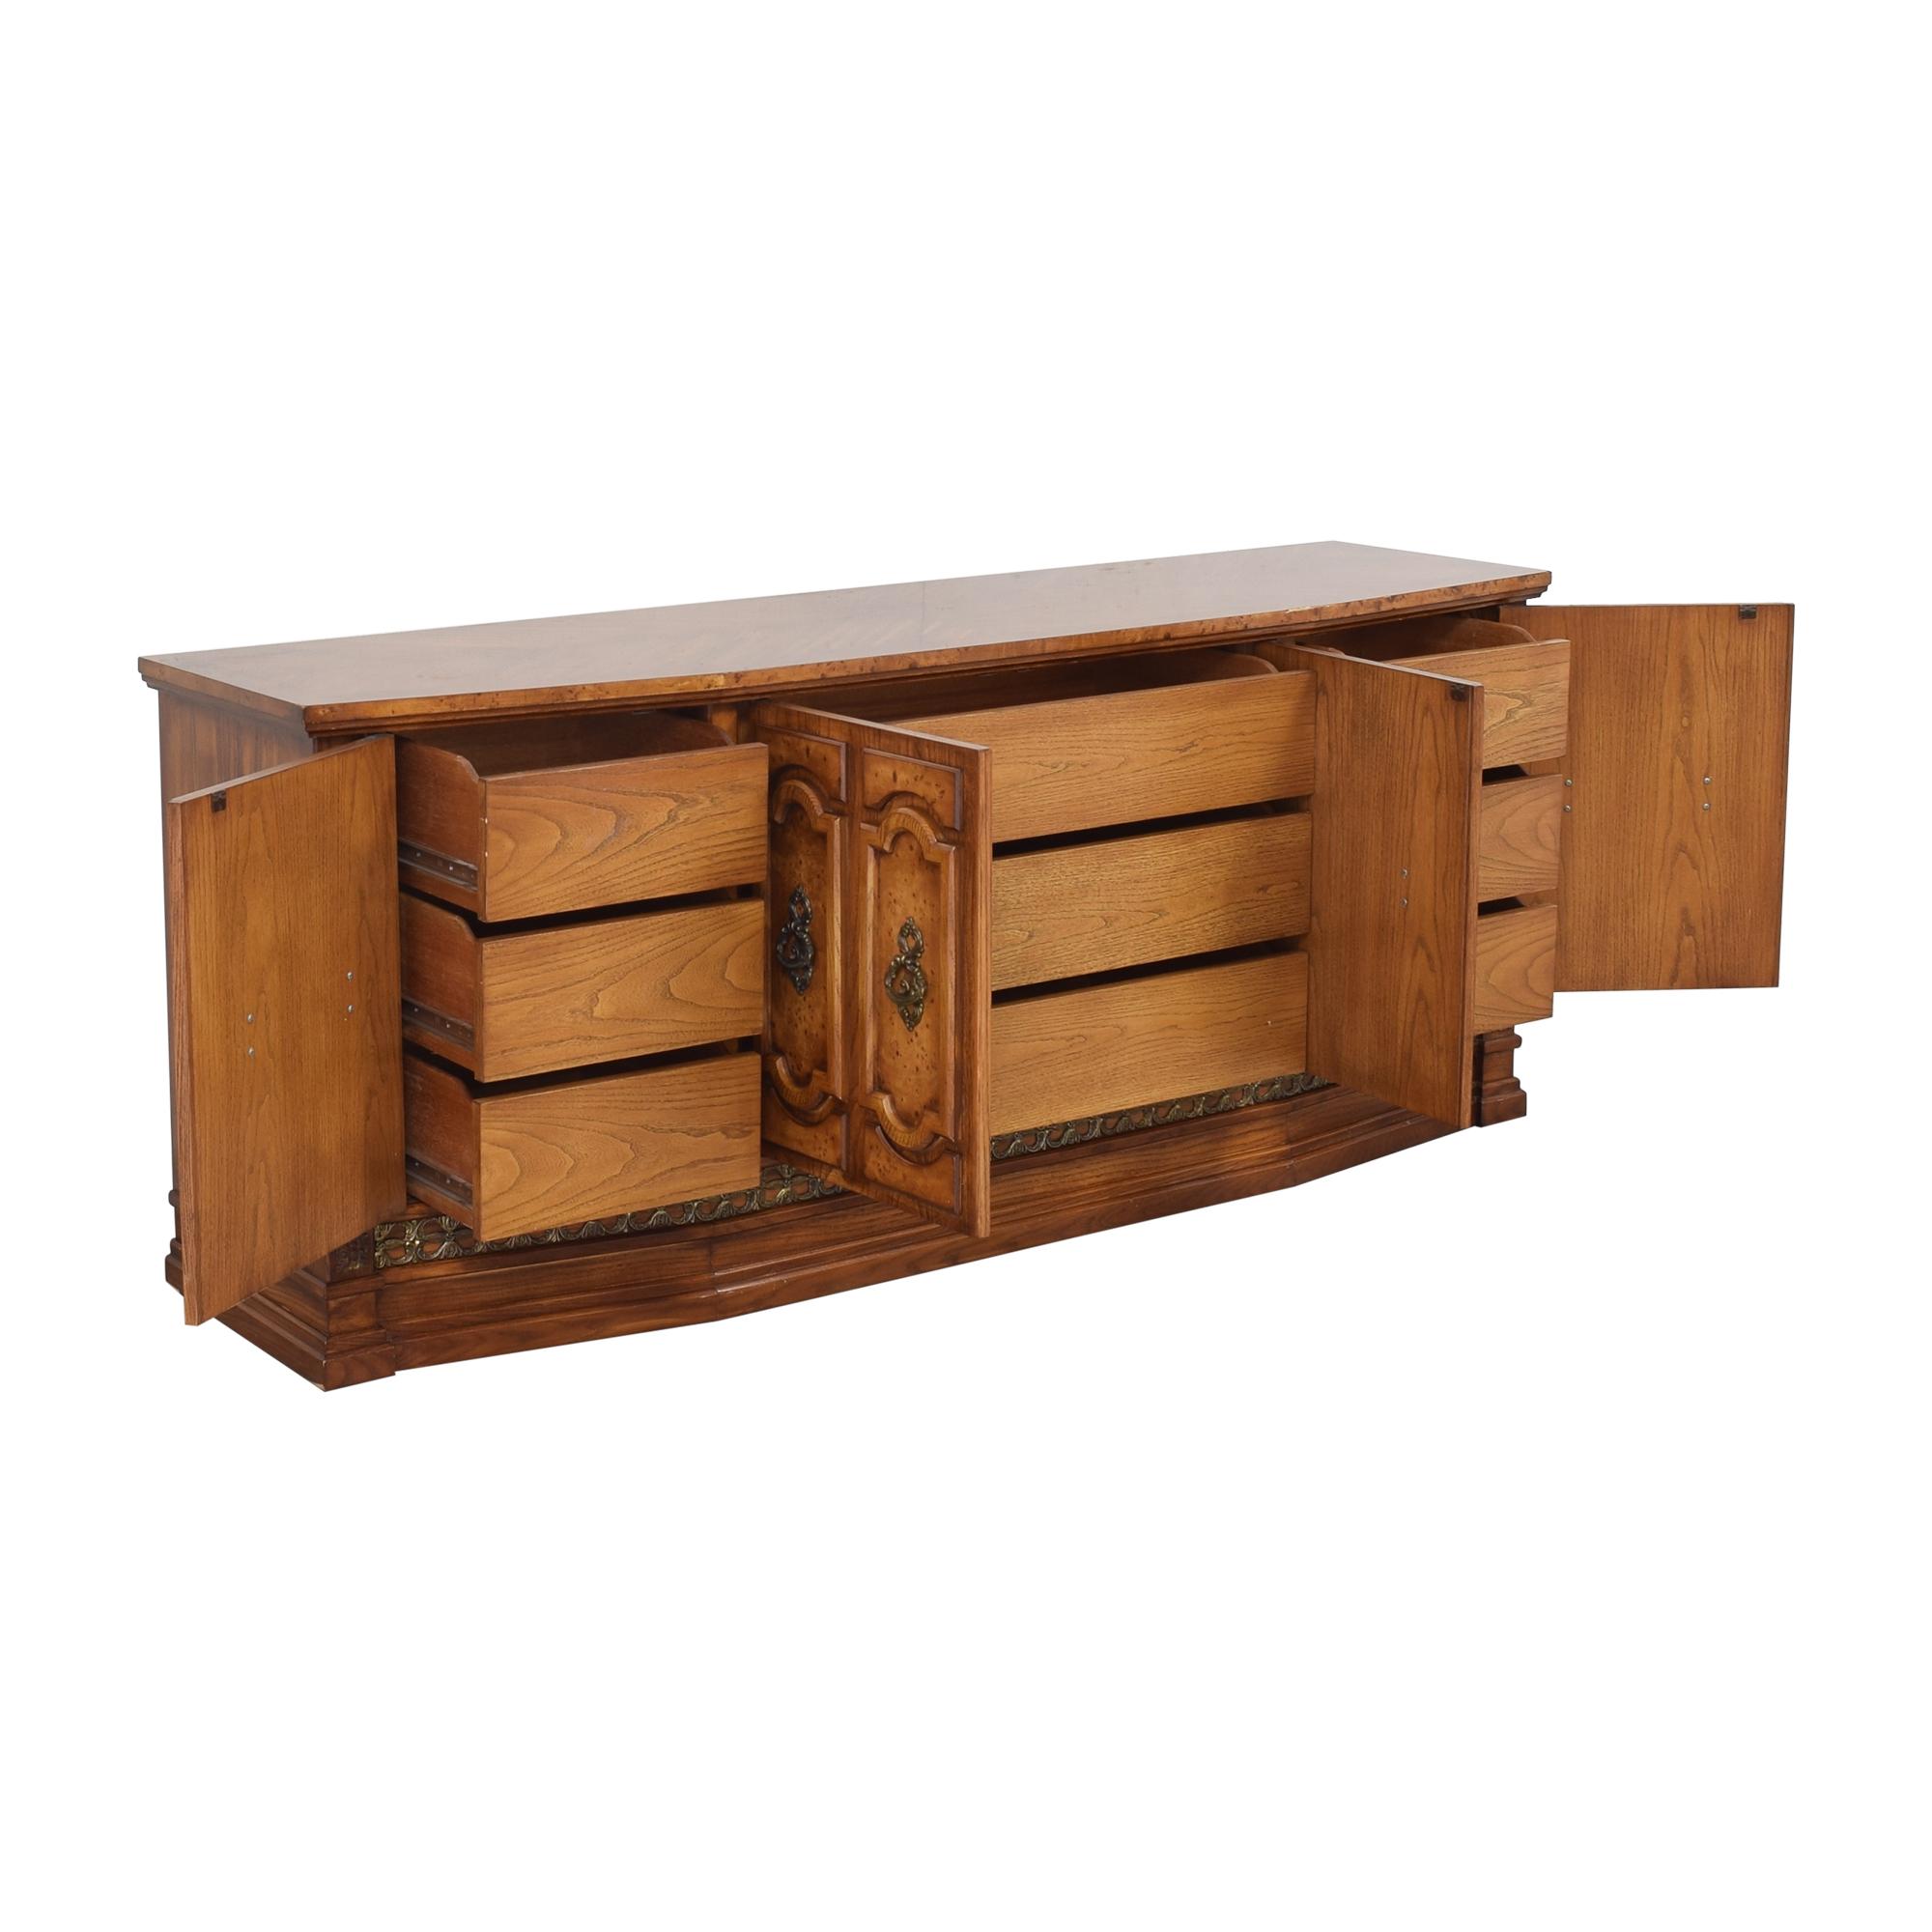 Nine Drawer Sideboard nj